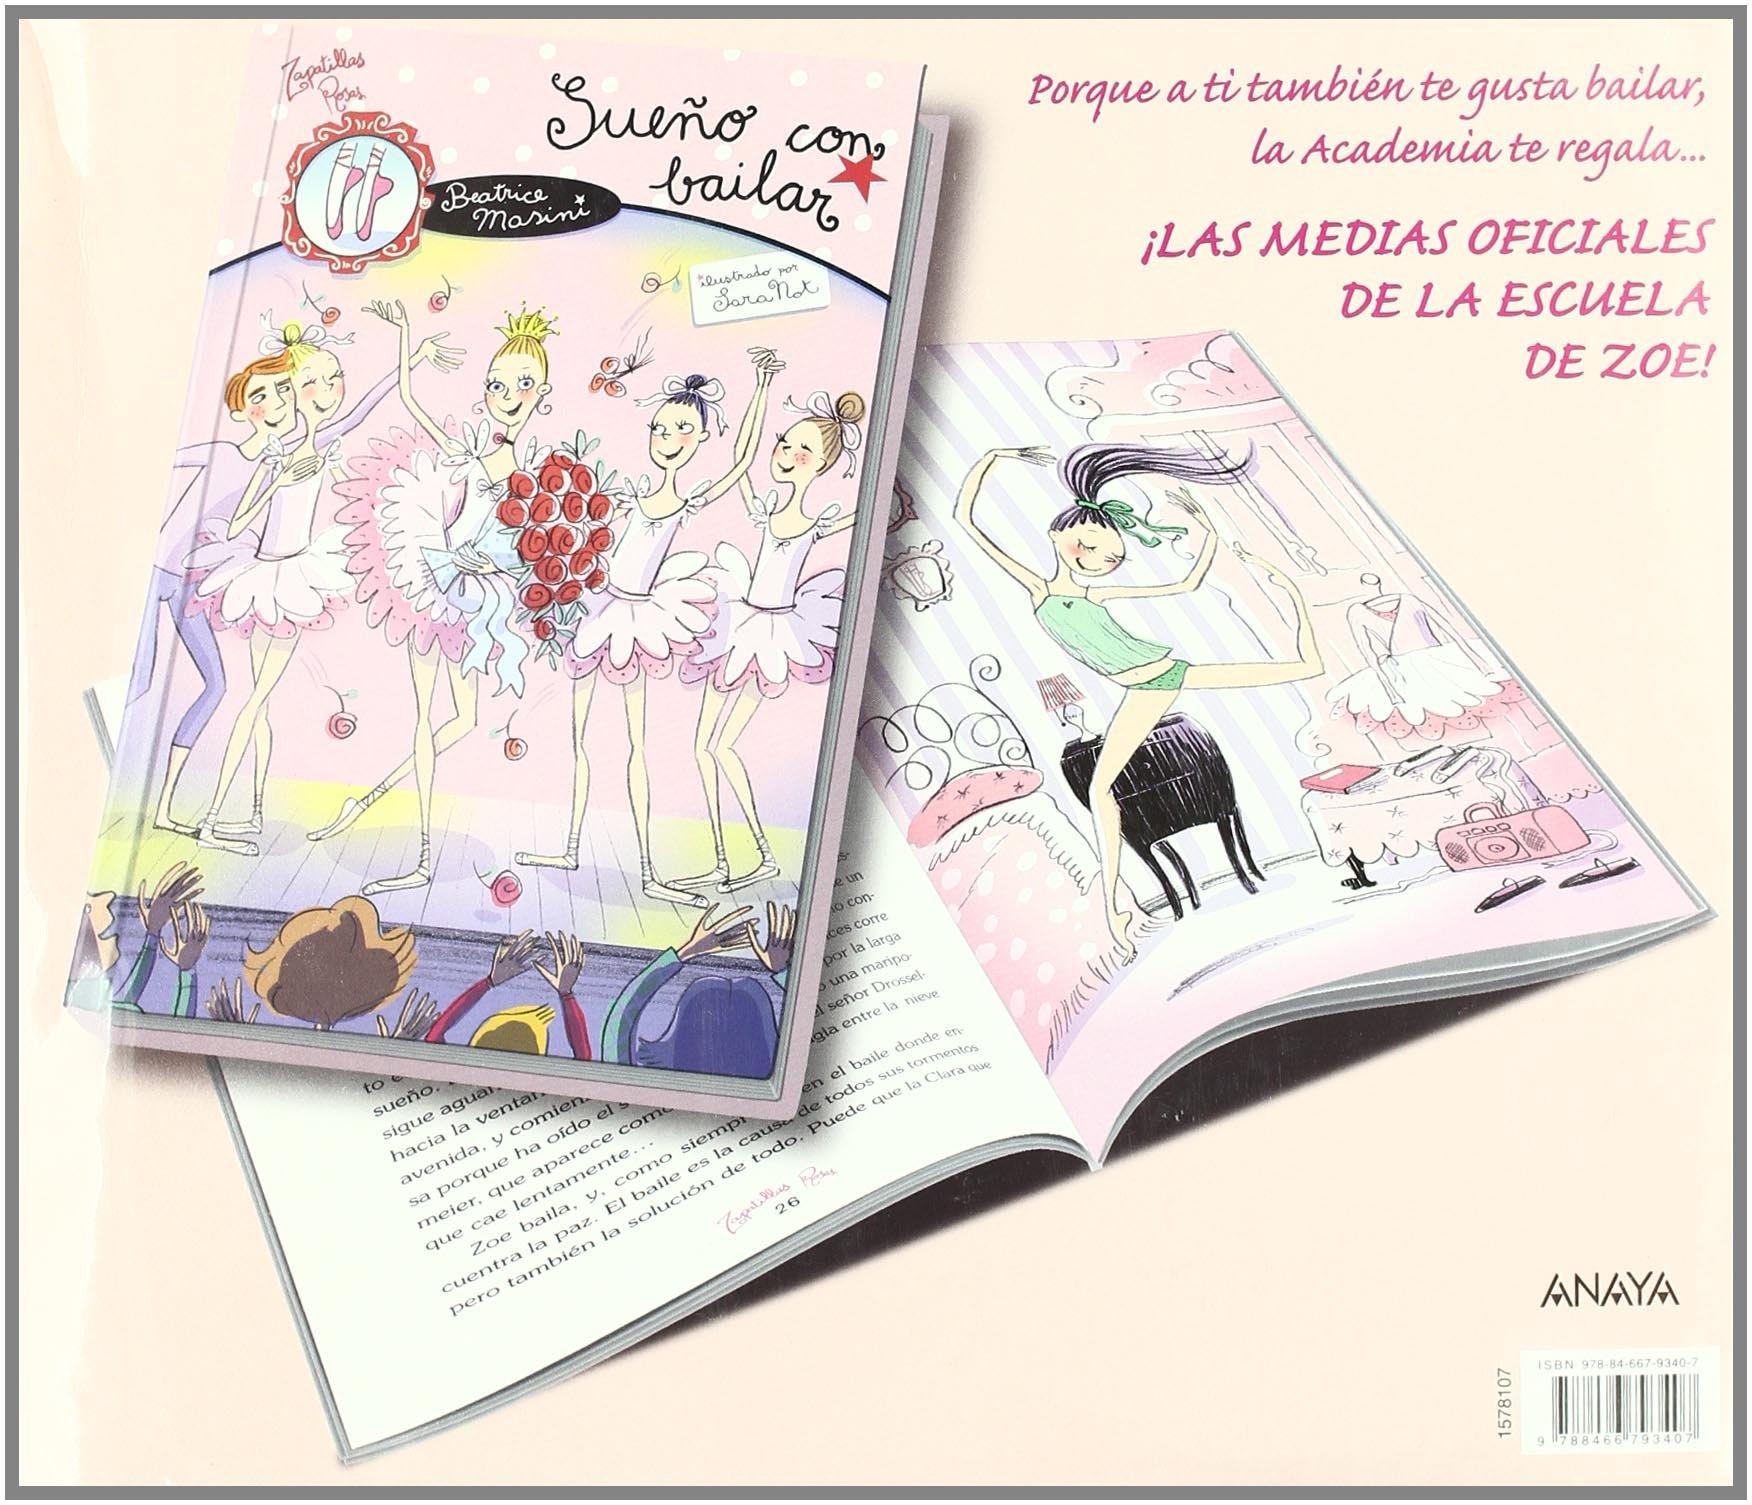 Amazon.com: Sueño con bailar / I Dream of Dancing (Zapatillas rosas / Pink Slippers) (Spanish Edition) (9788466793407): Beatrice Masini, Sara Not, ...